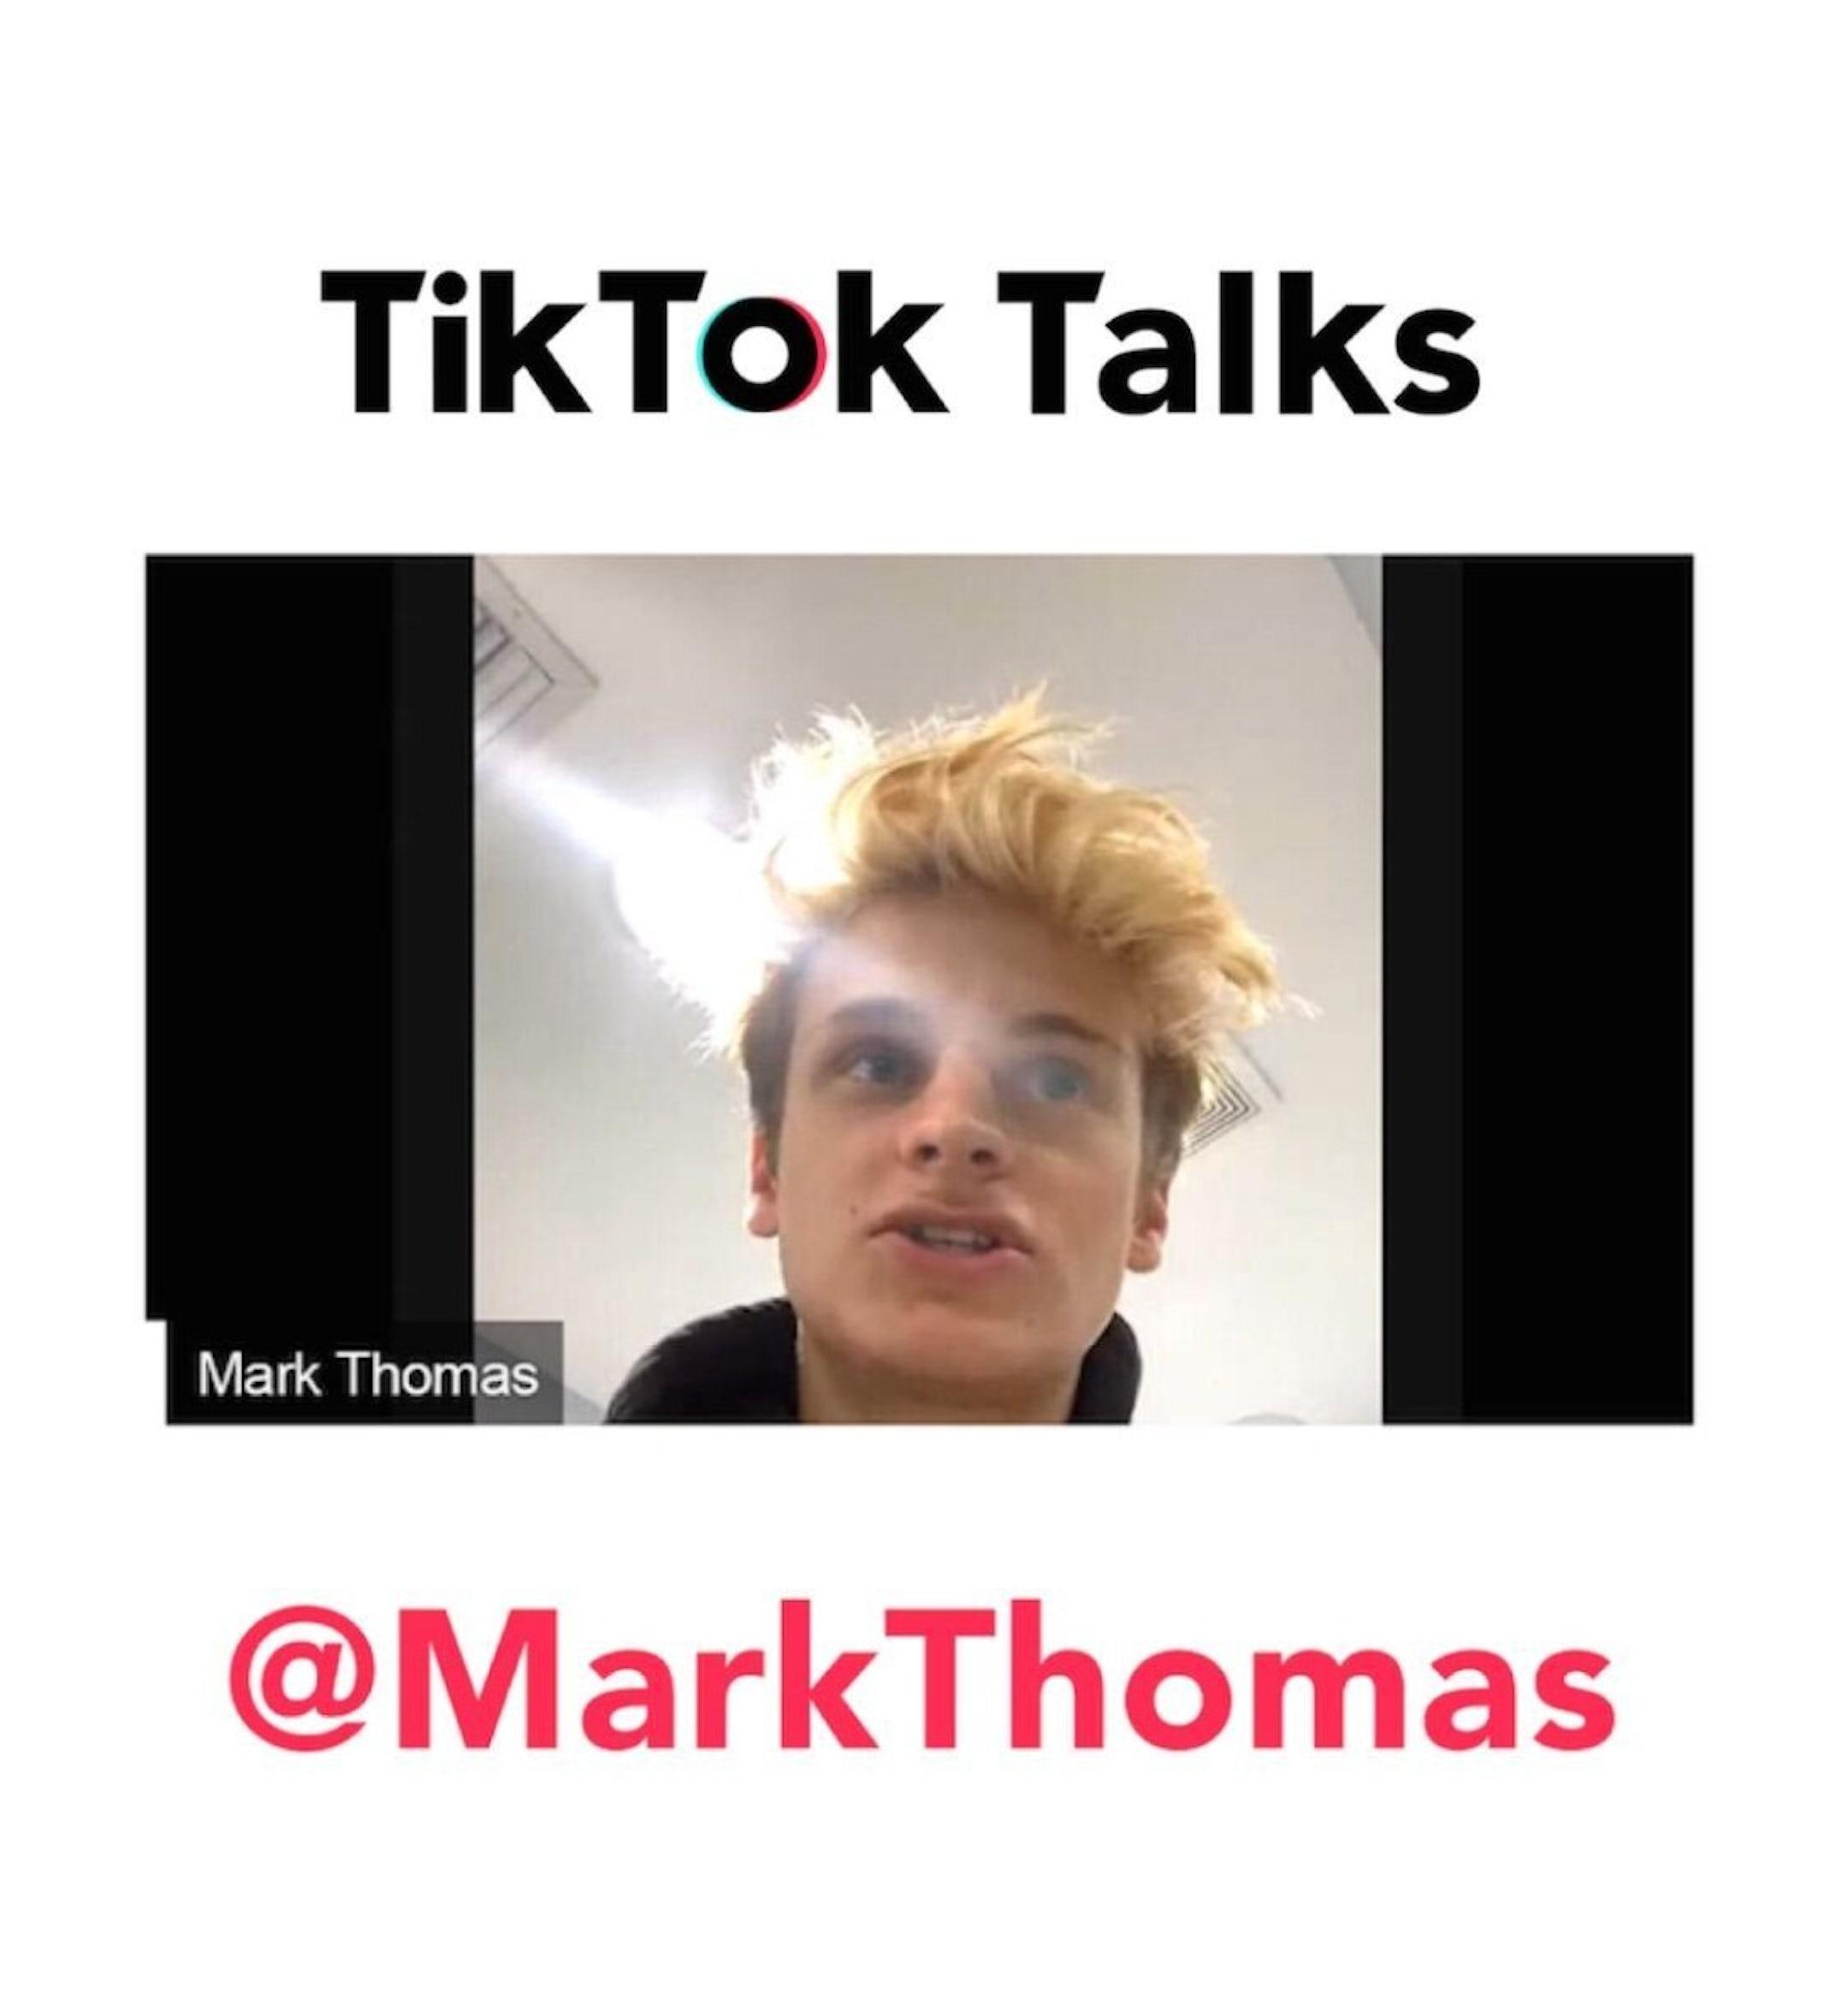 tiktok MarkThomas WebImage